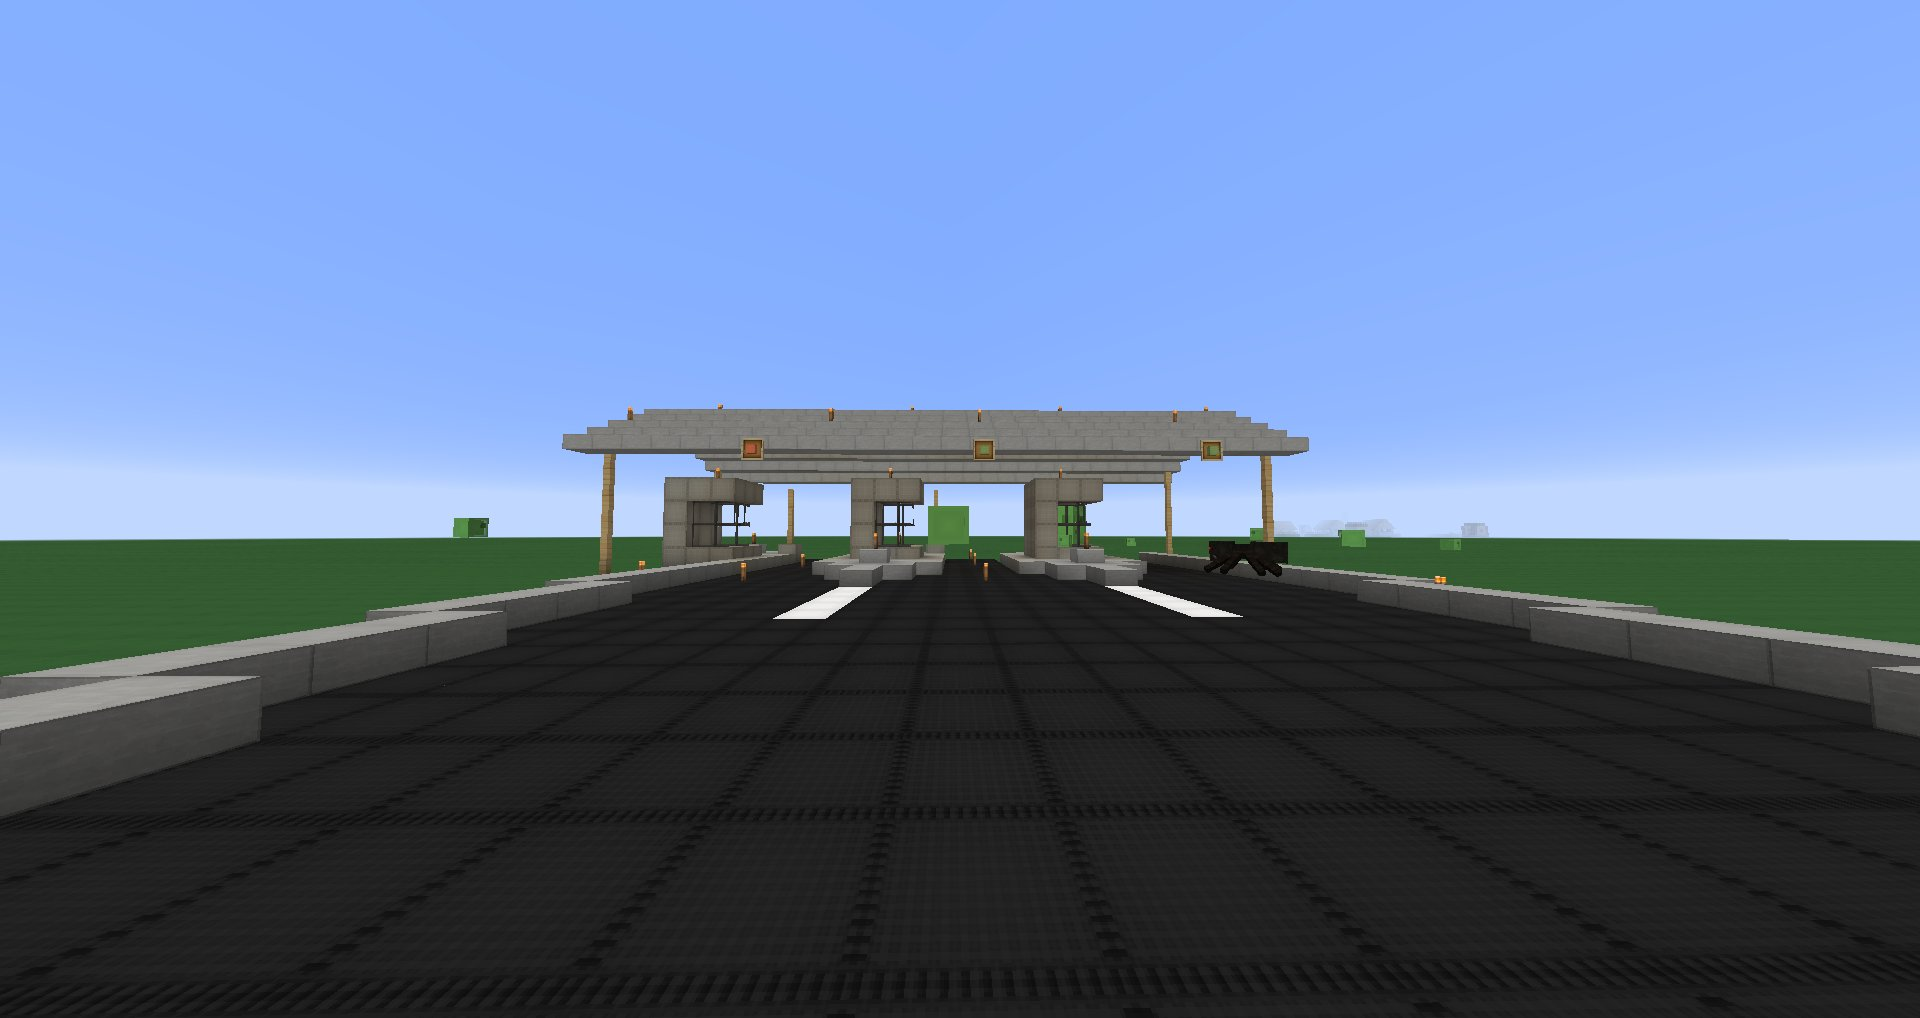 [PROJET] Aéroport International de Rodwin. - Page 7 E4b04750-cef0-4c38-8f5a-579cf9b3ef52